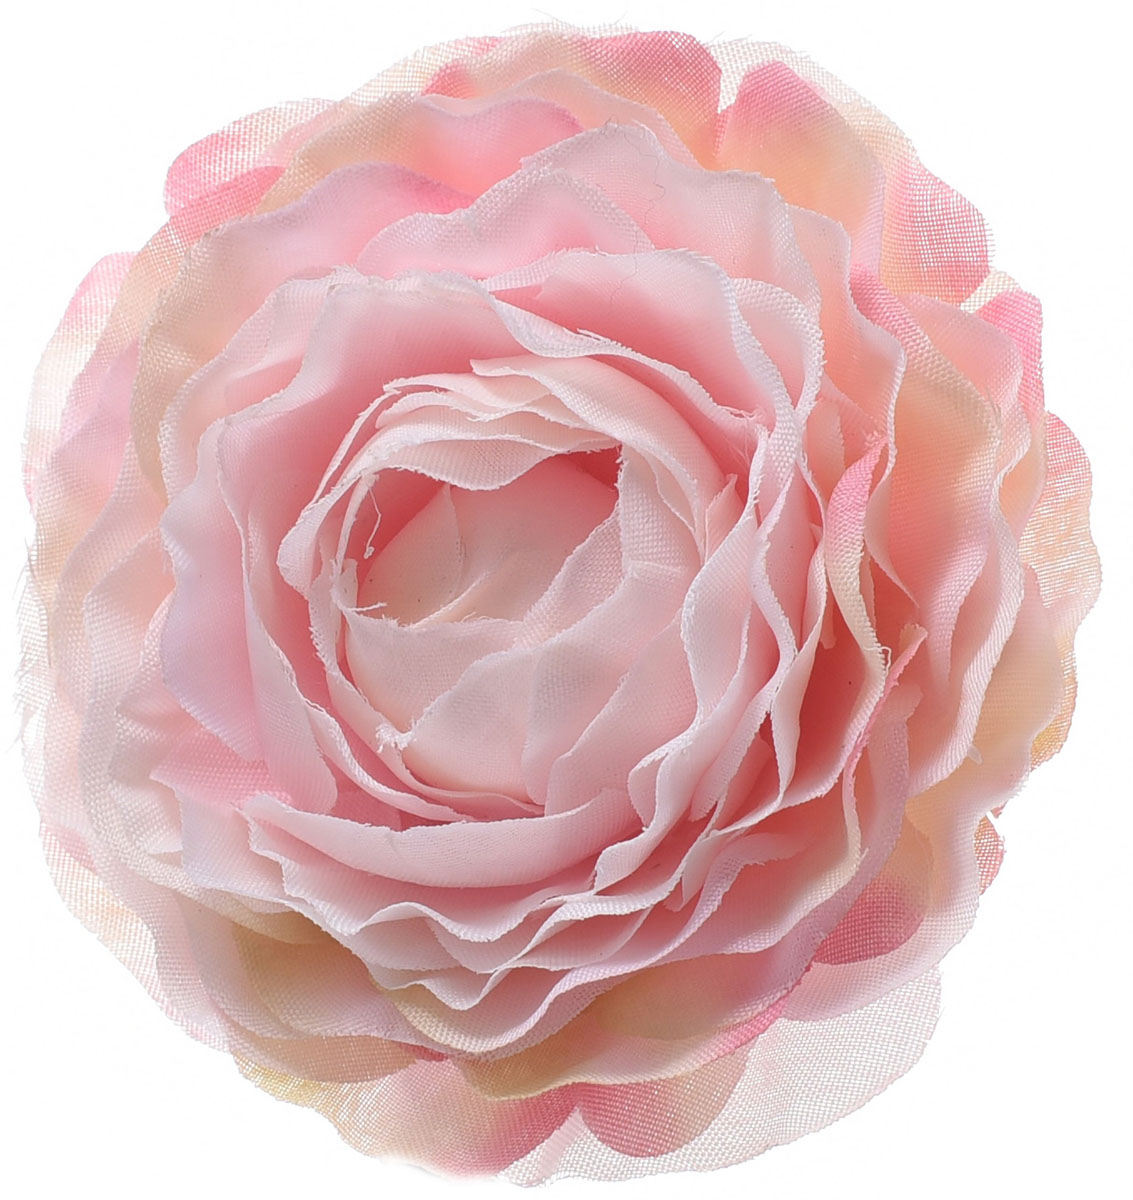 Резинка для волос Malina By Андерсен Флер, цвет: розовый. 11801рб1011801рб10